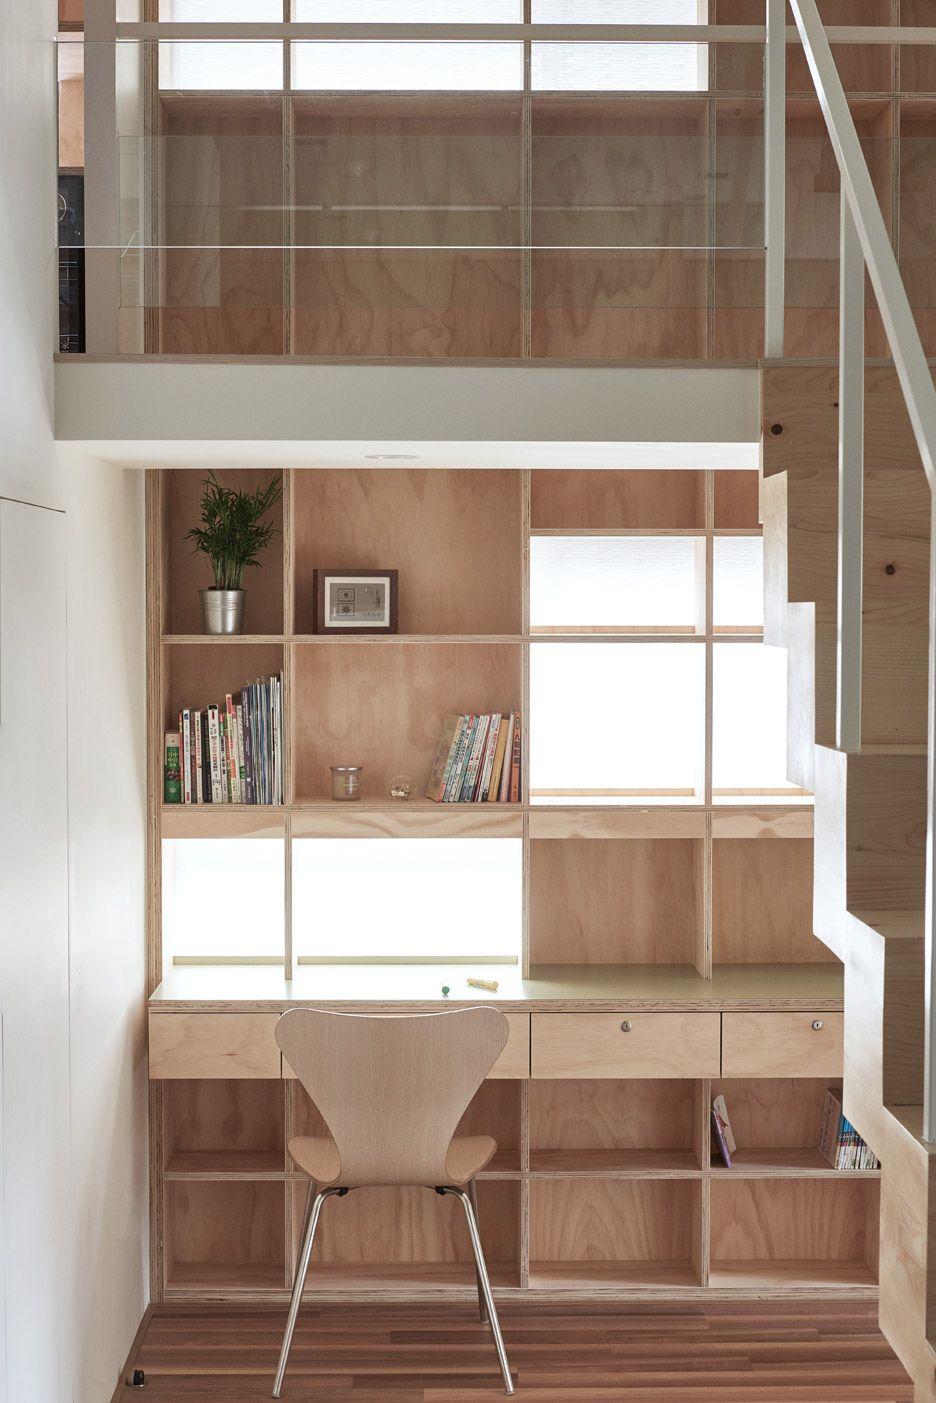 Apartment by Hao Design has house-shaped doors | Shelves, Desks ...